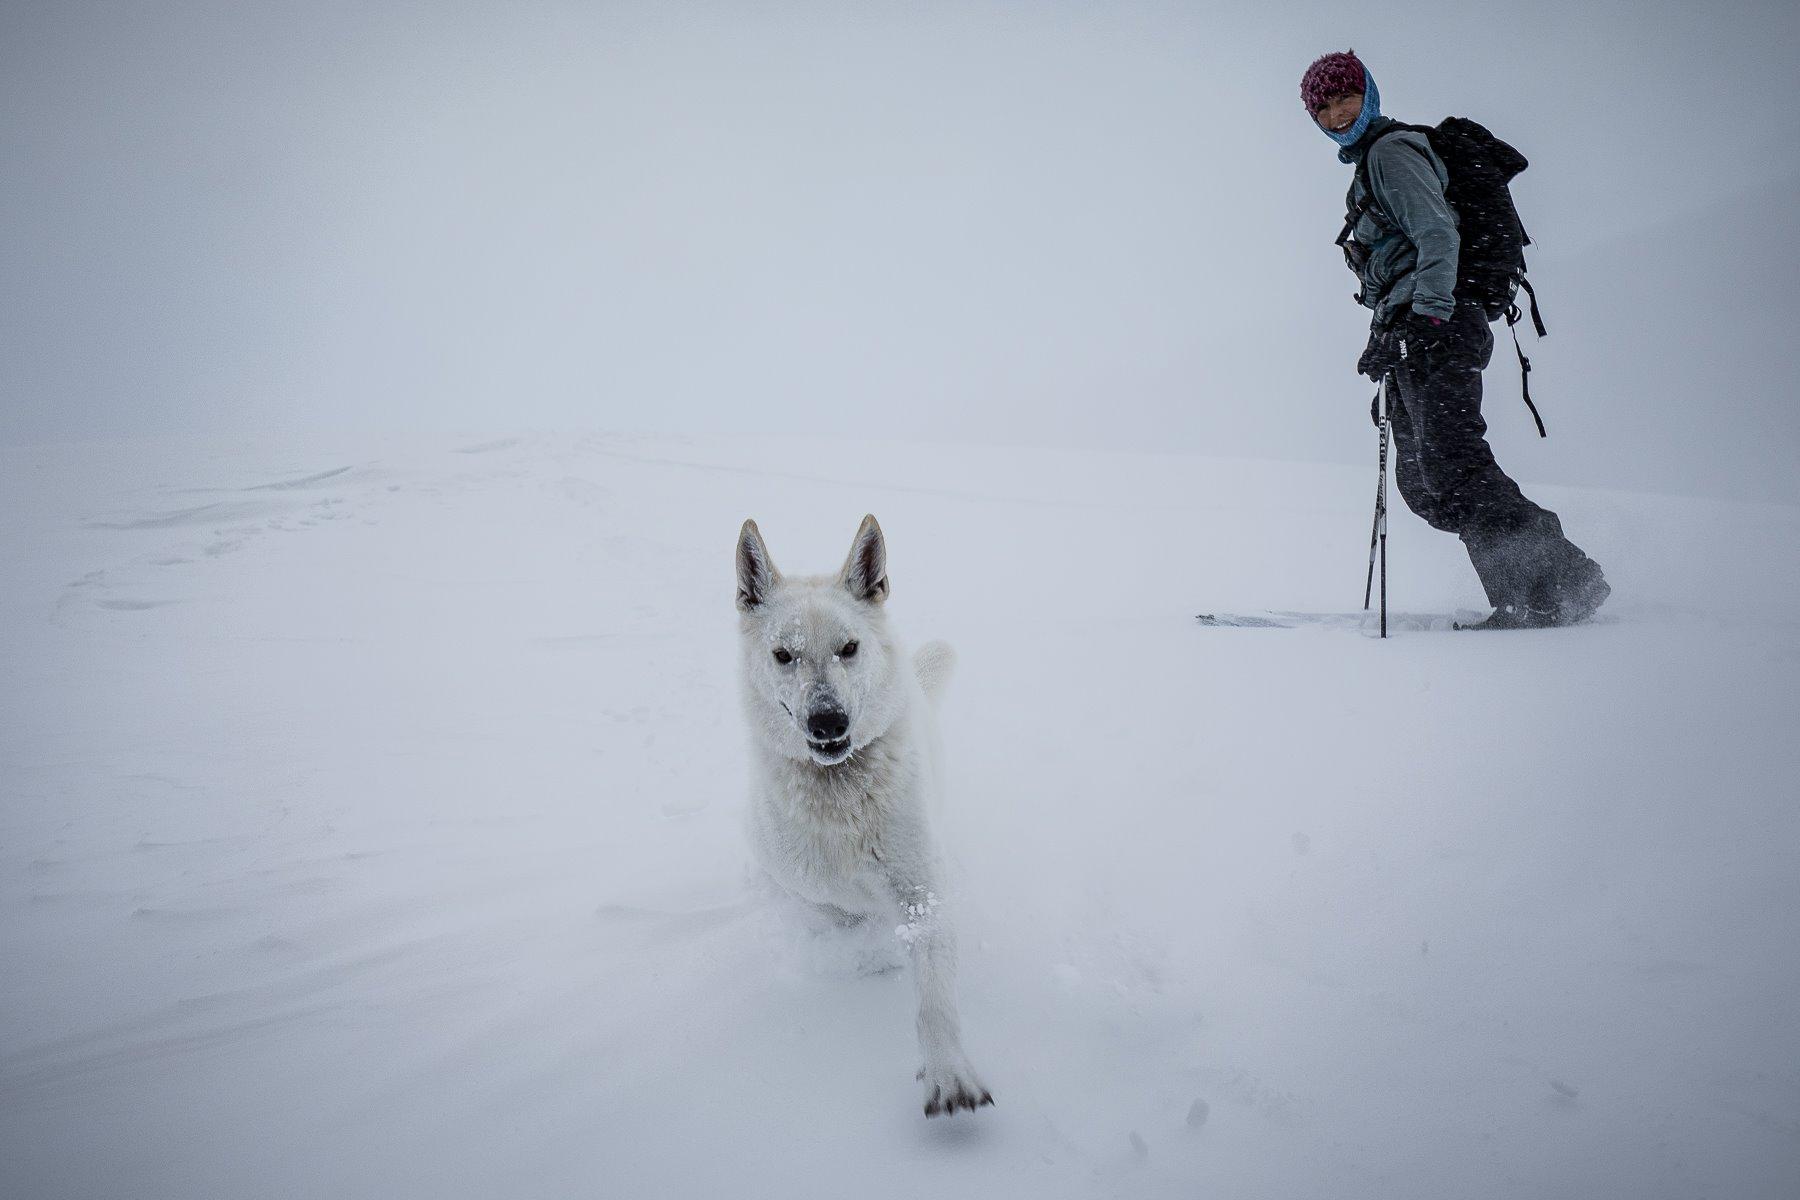 snow-skiing-swiss-shephard.jpg